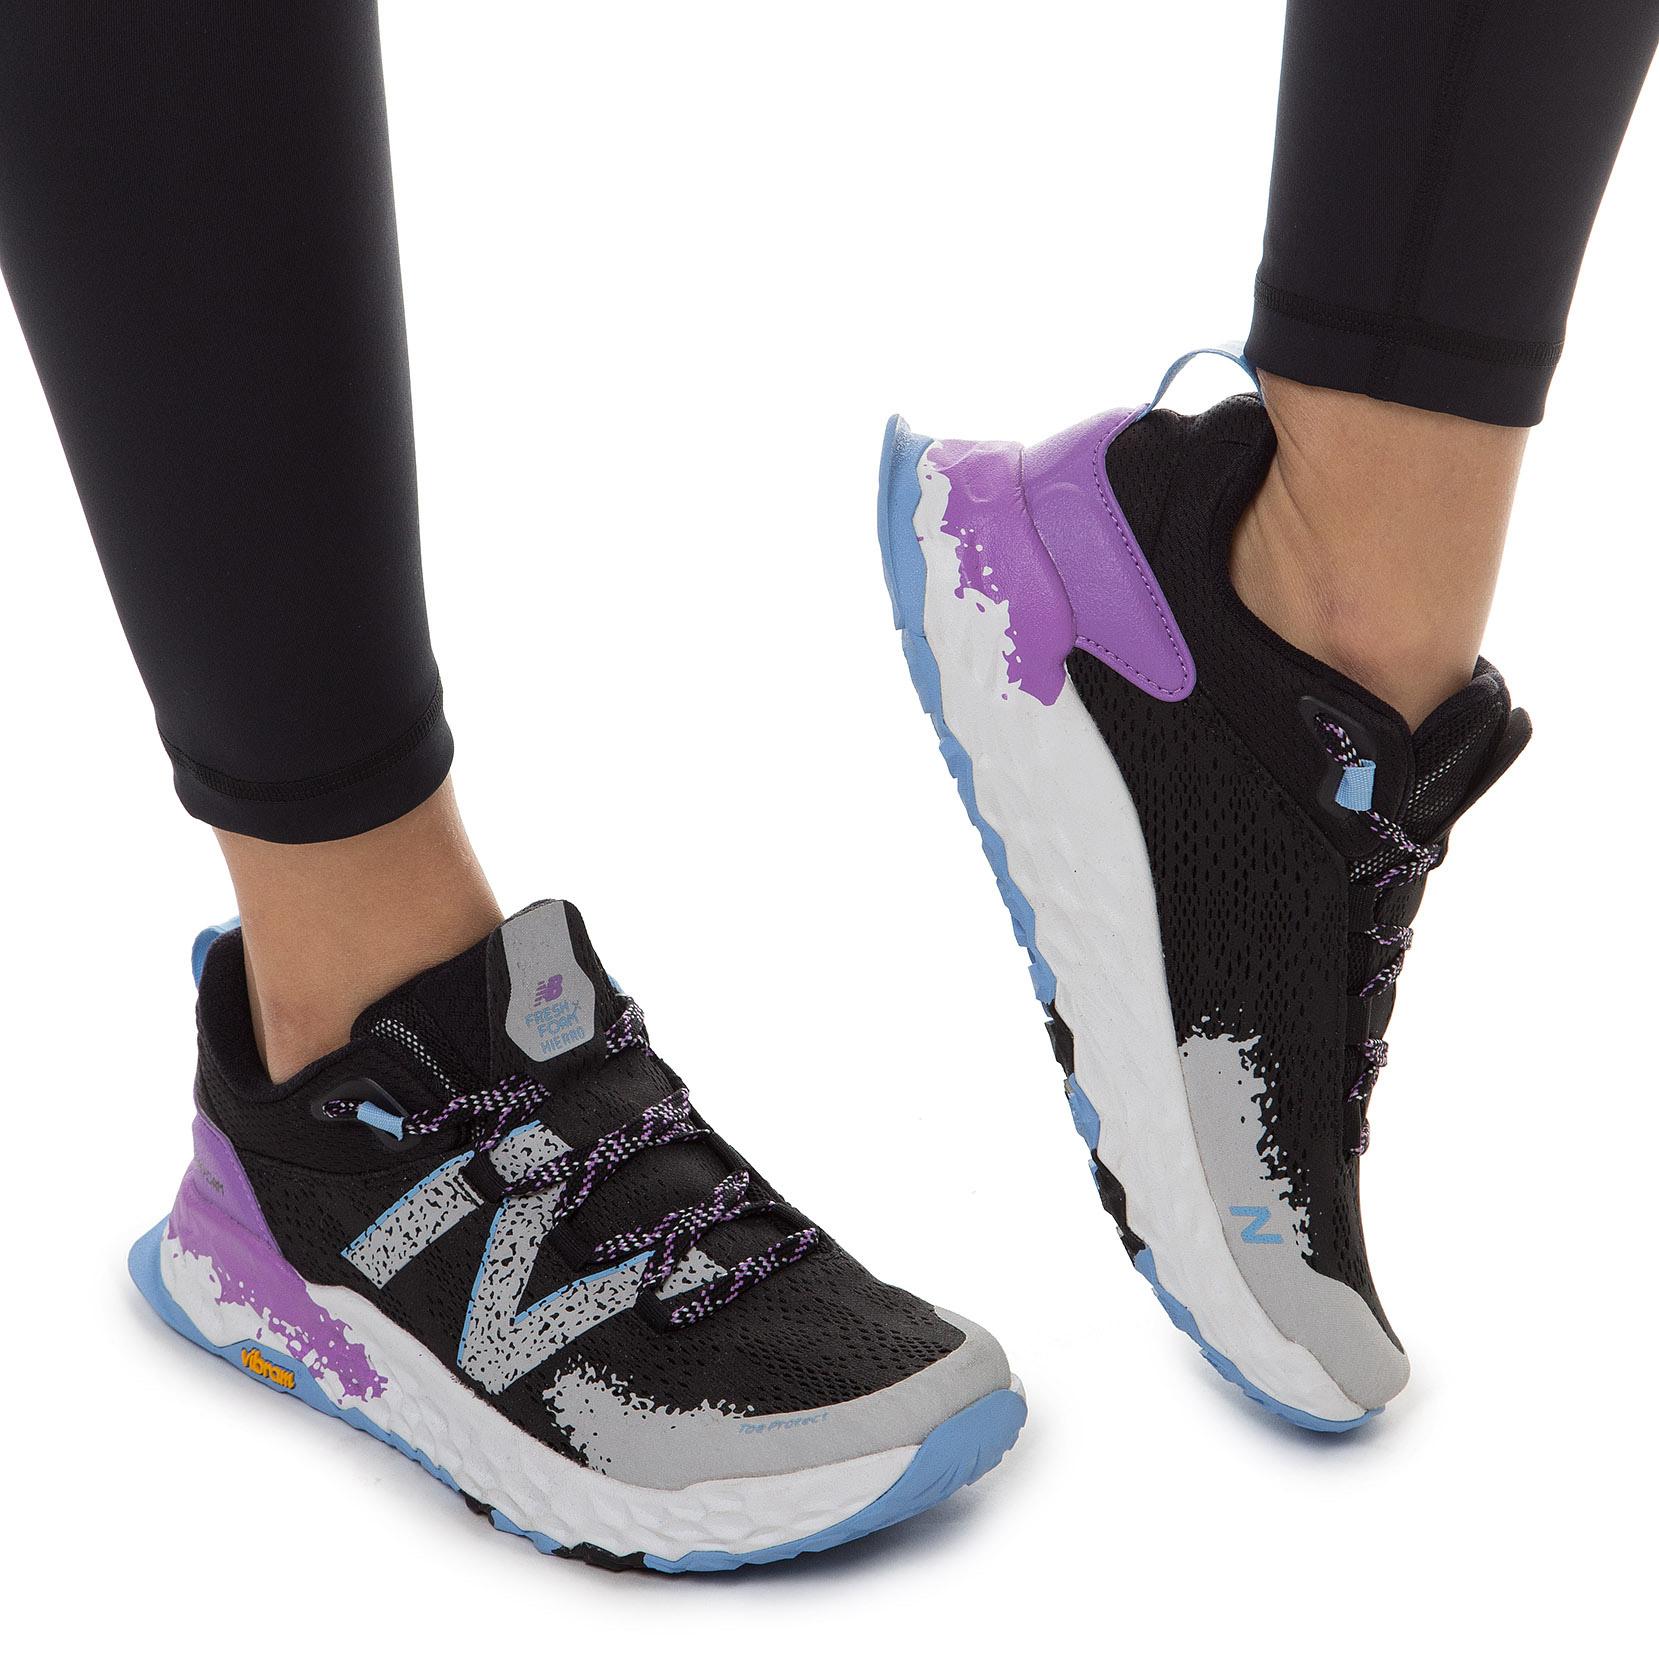 Жіноче взуття для бігу Fresh Foam Hierro v5 WTHIERP5 | New Balance